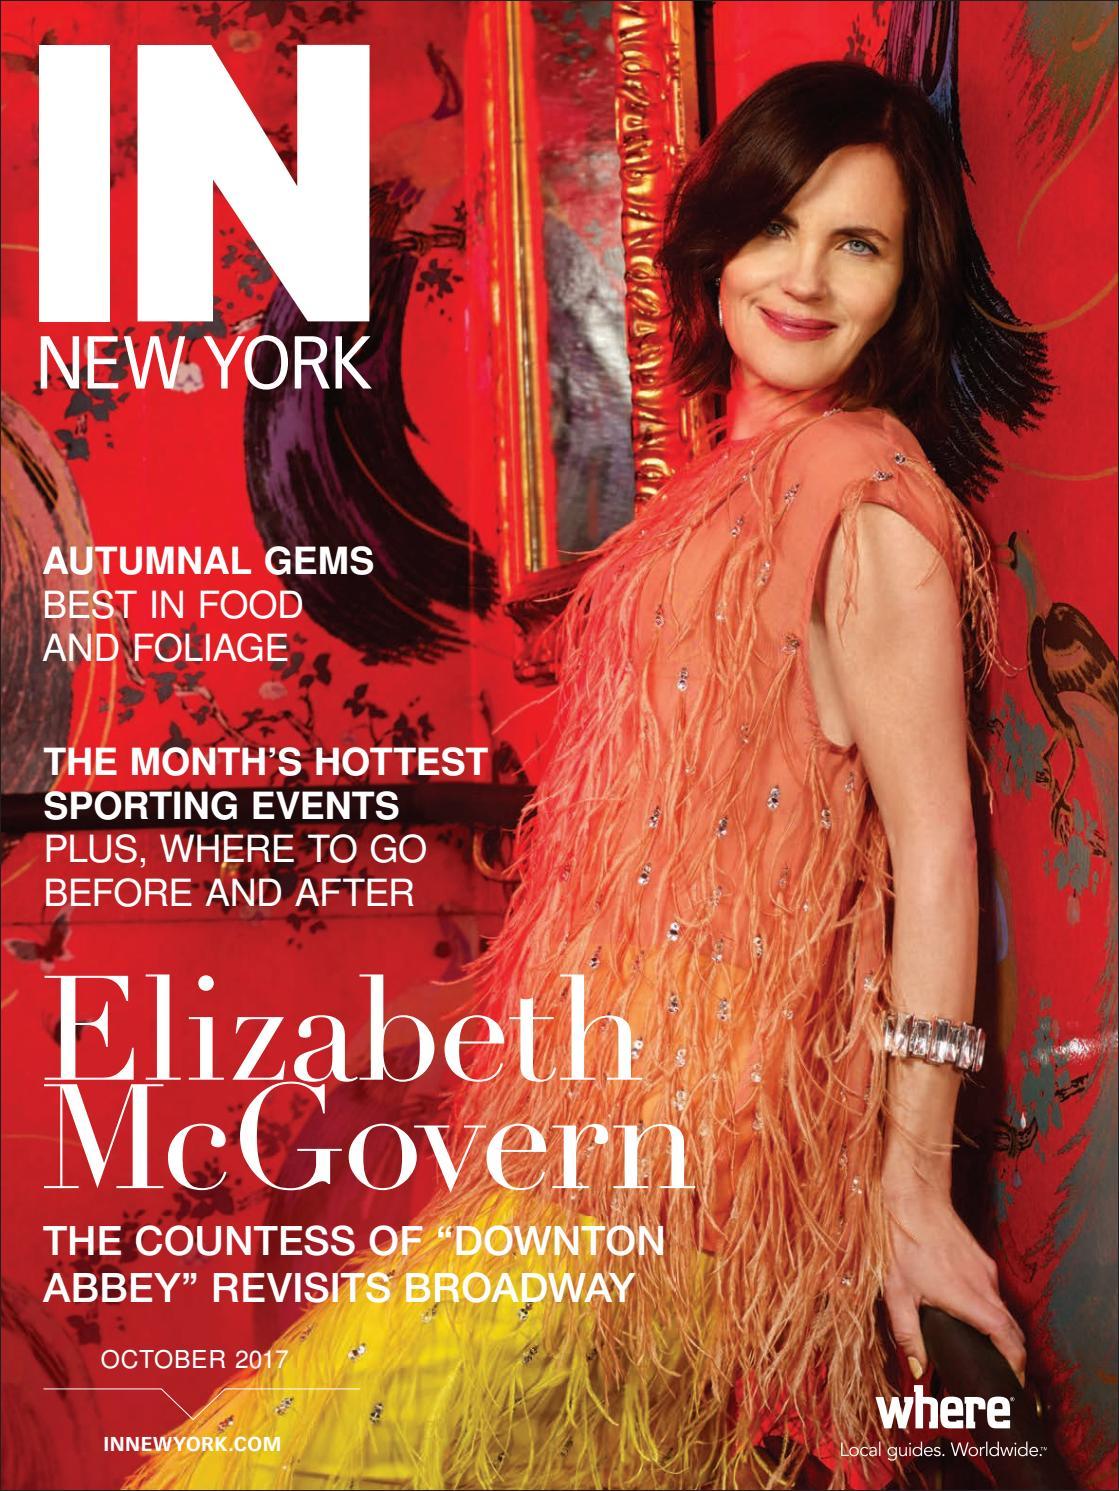 9303d1b3dc IN New York Magazine New York October 2017 by Morris Media Network - issuu